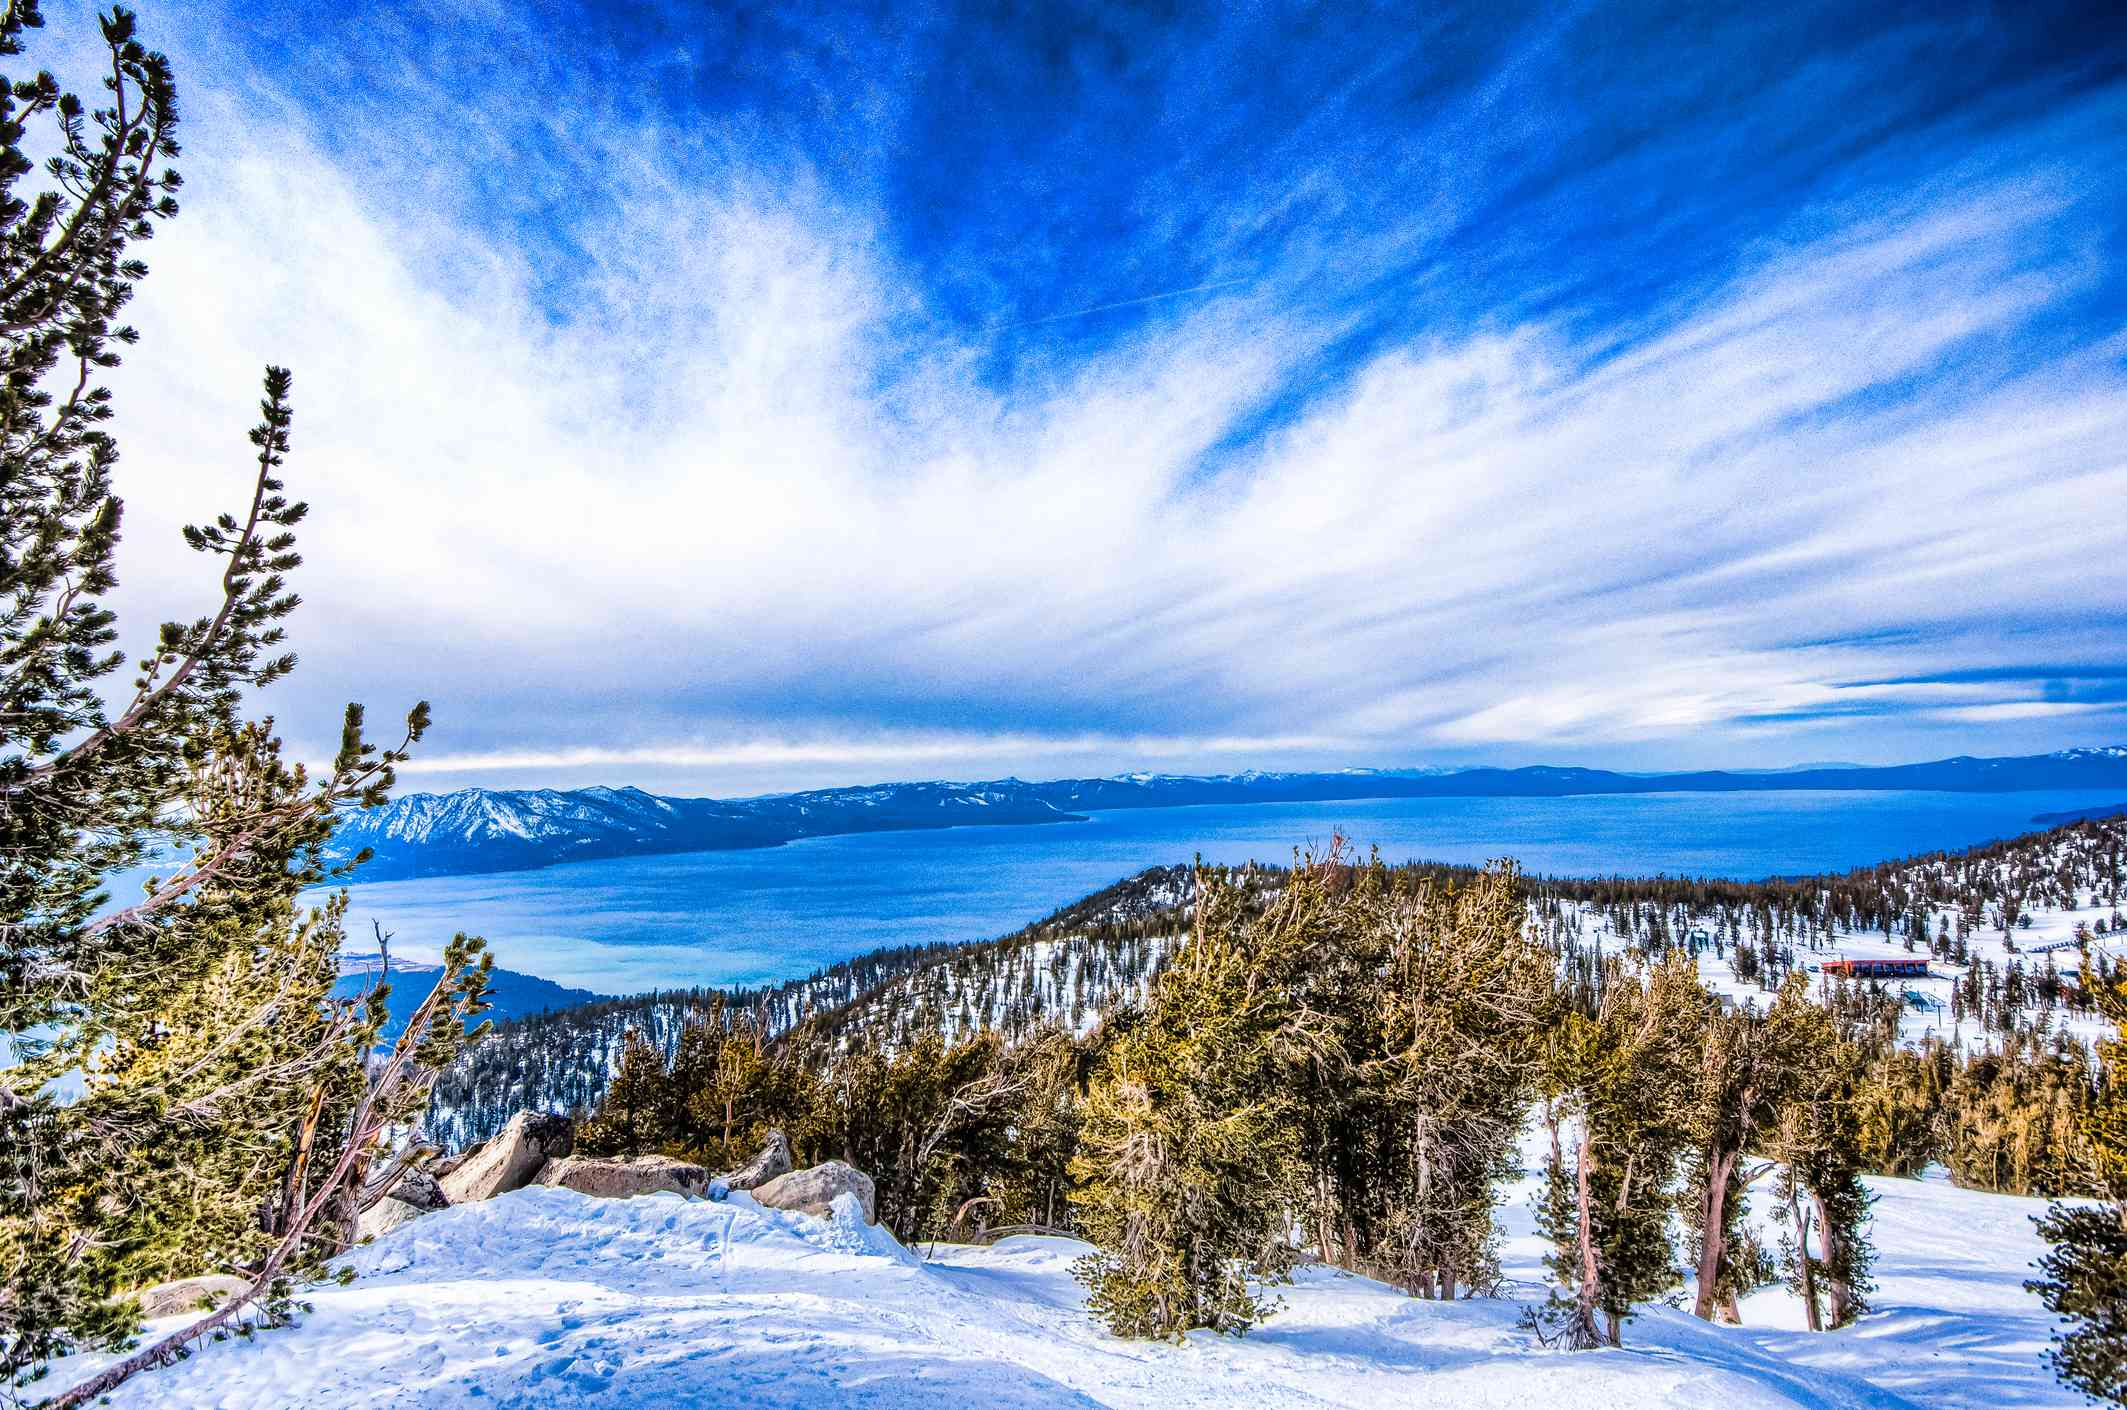 Lake Tahoe from Heavenly Mountain resort